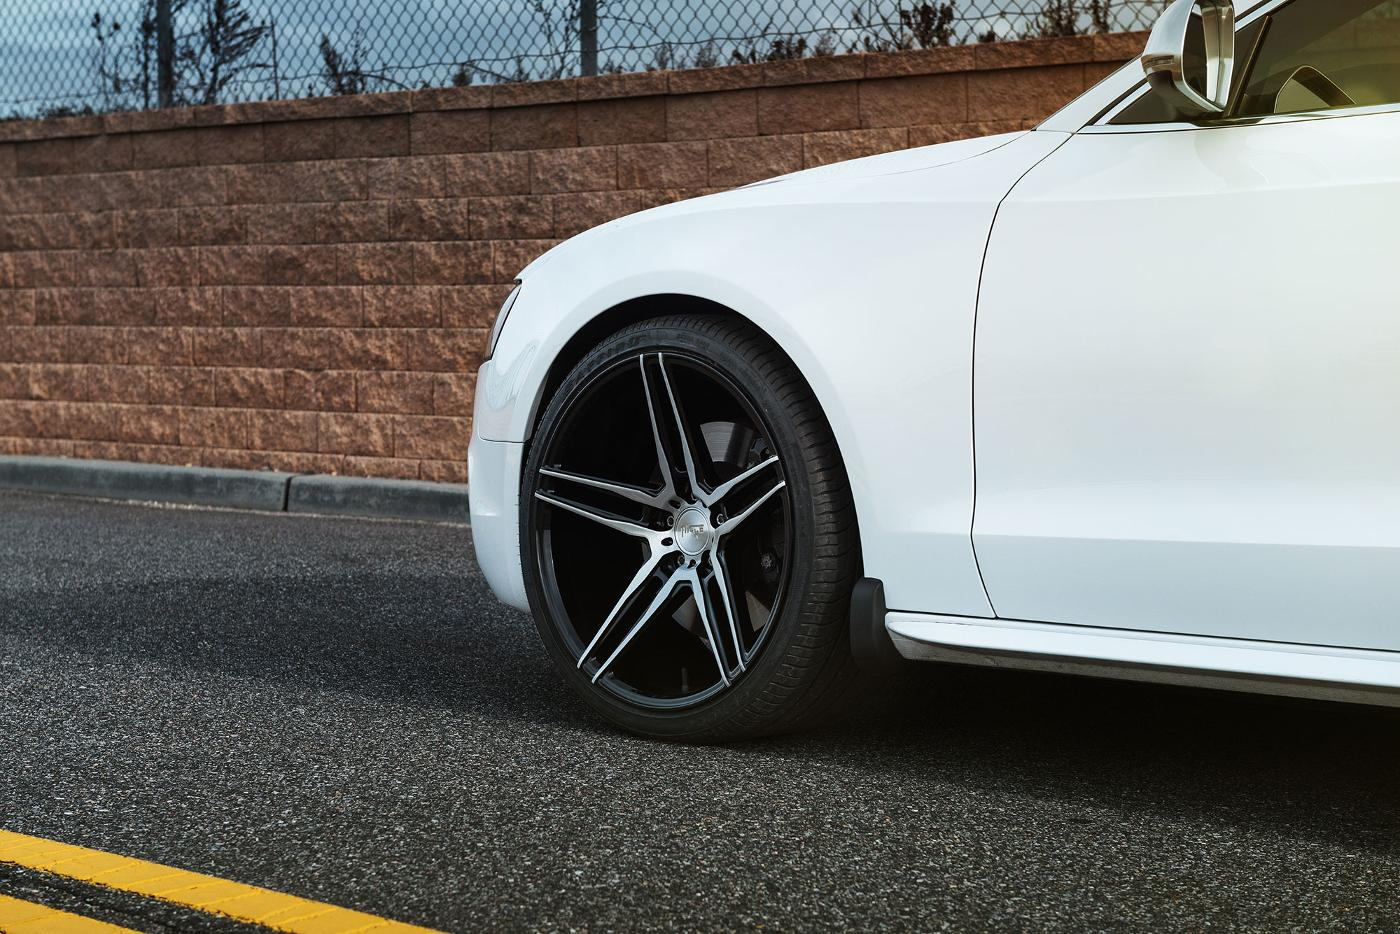 New Niche Turin M169 Audi S5 Mht Wheels Inc